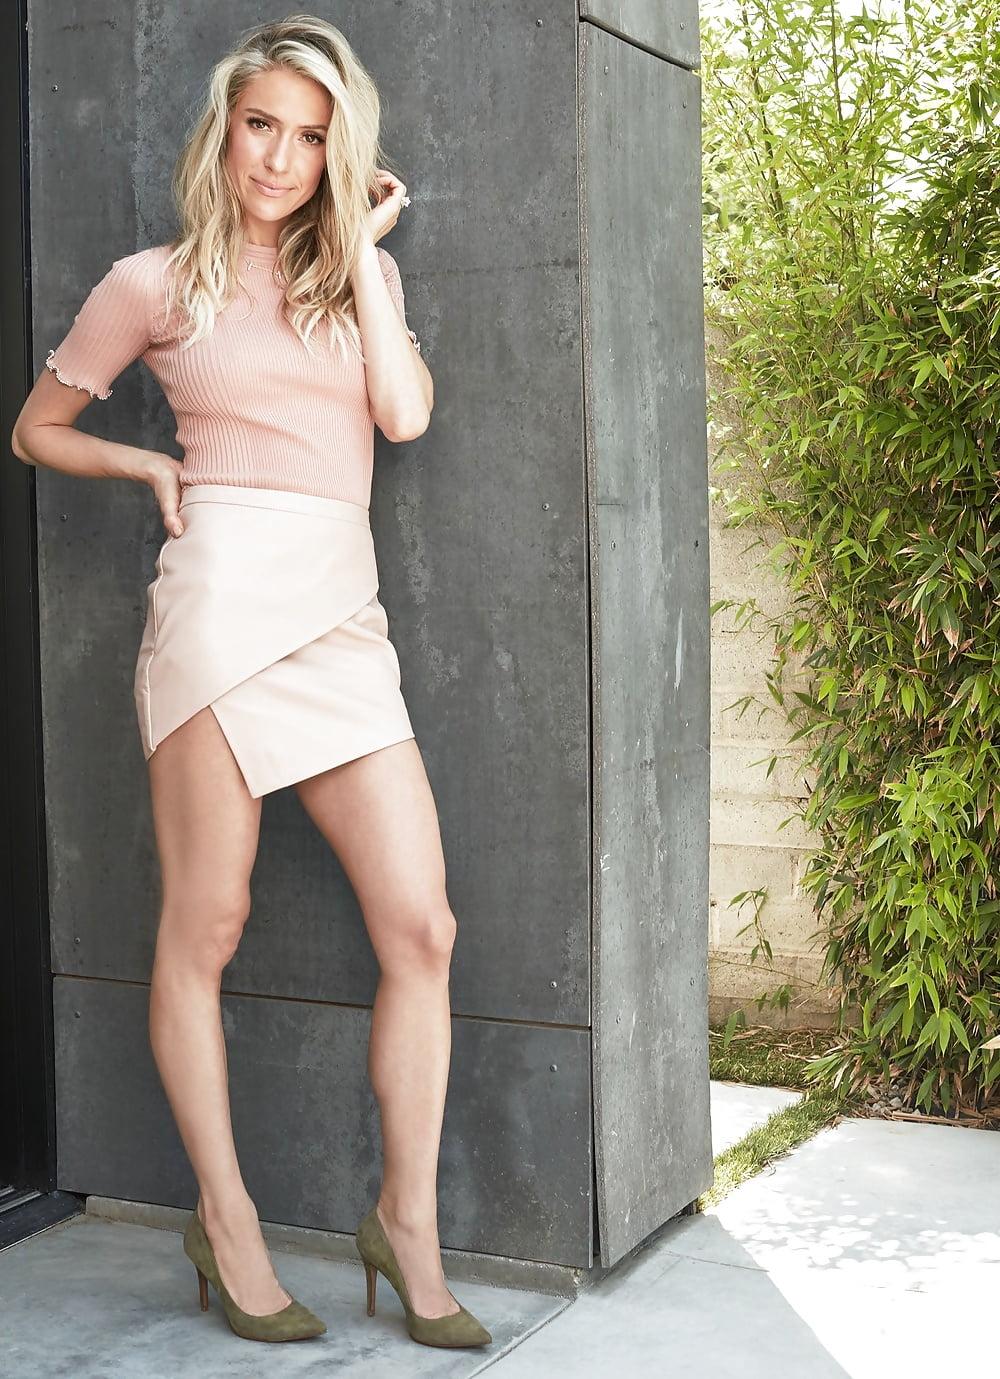 Booty Heidi Montag nude photos 2019